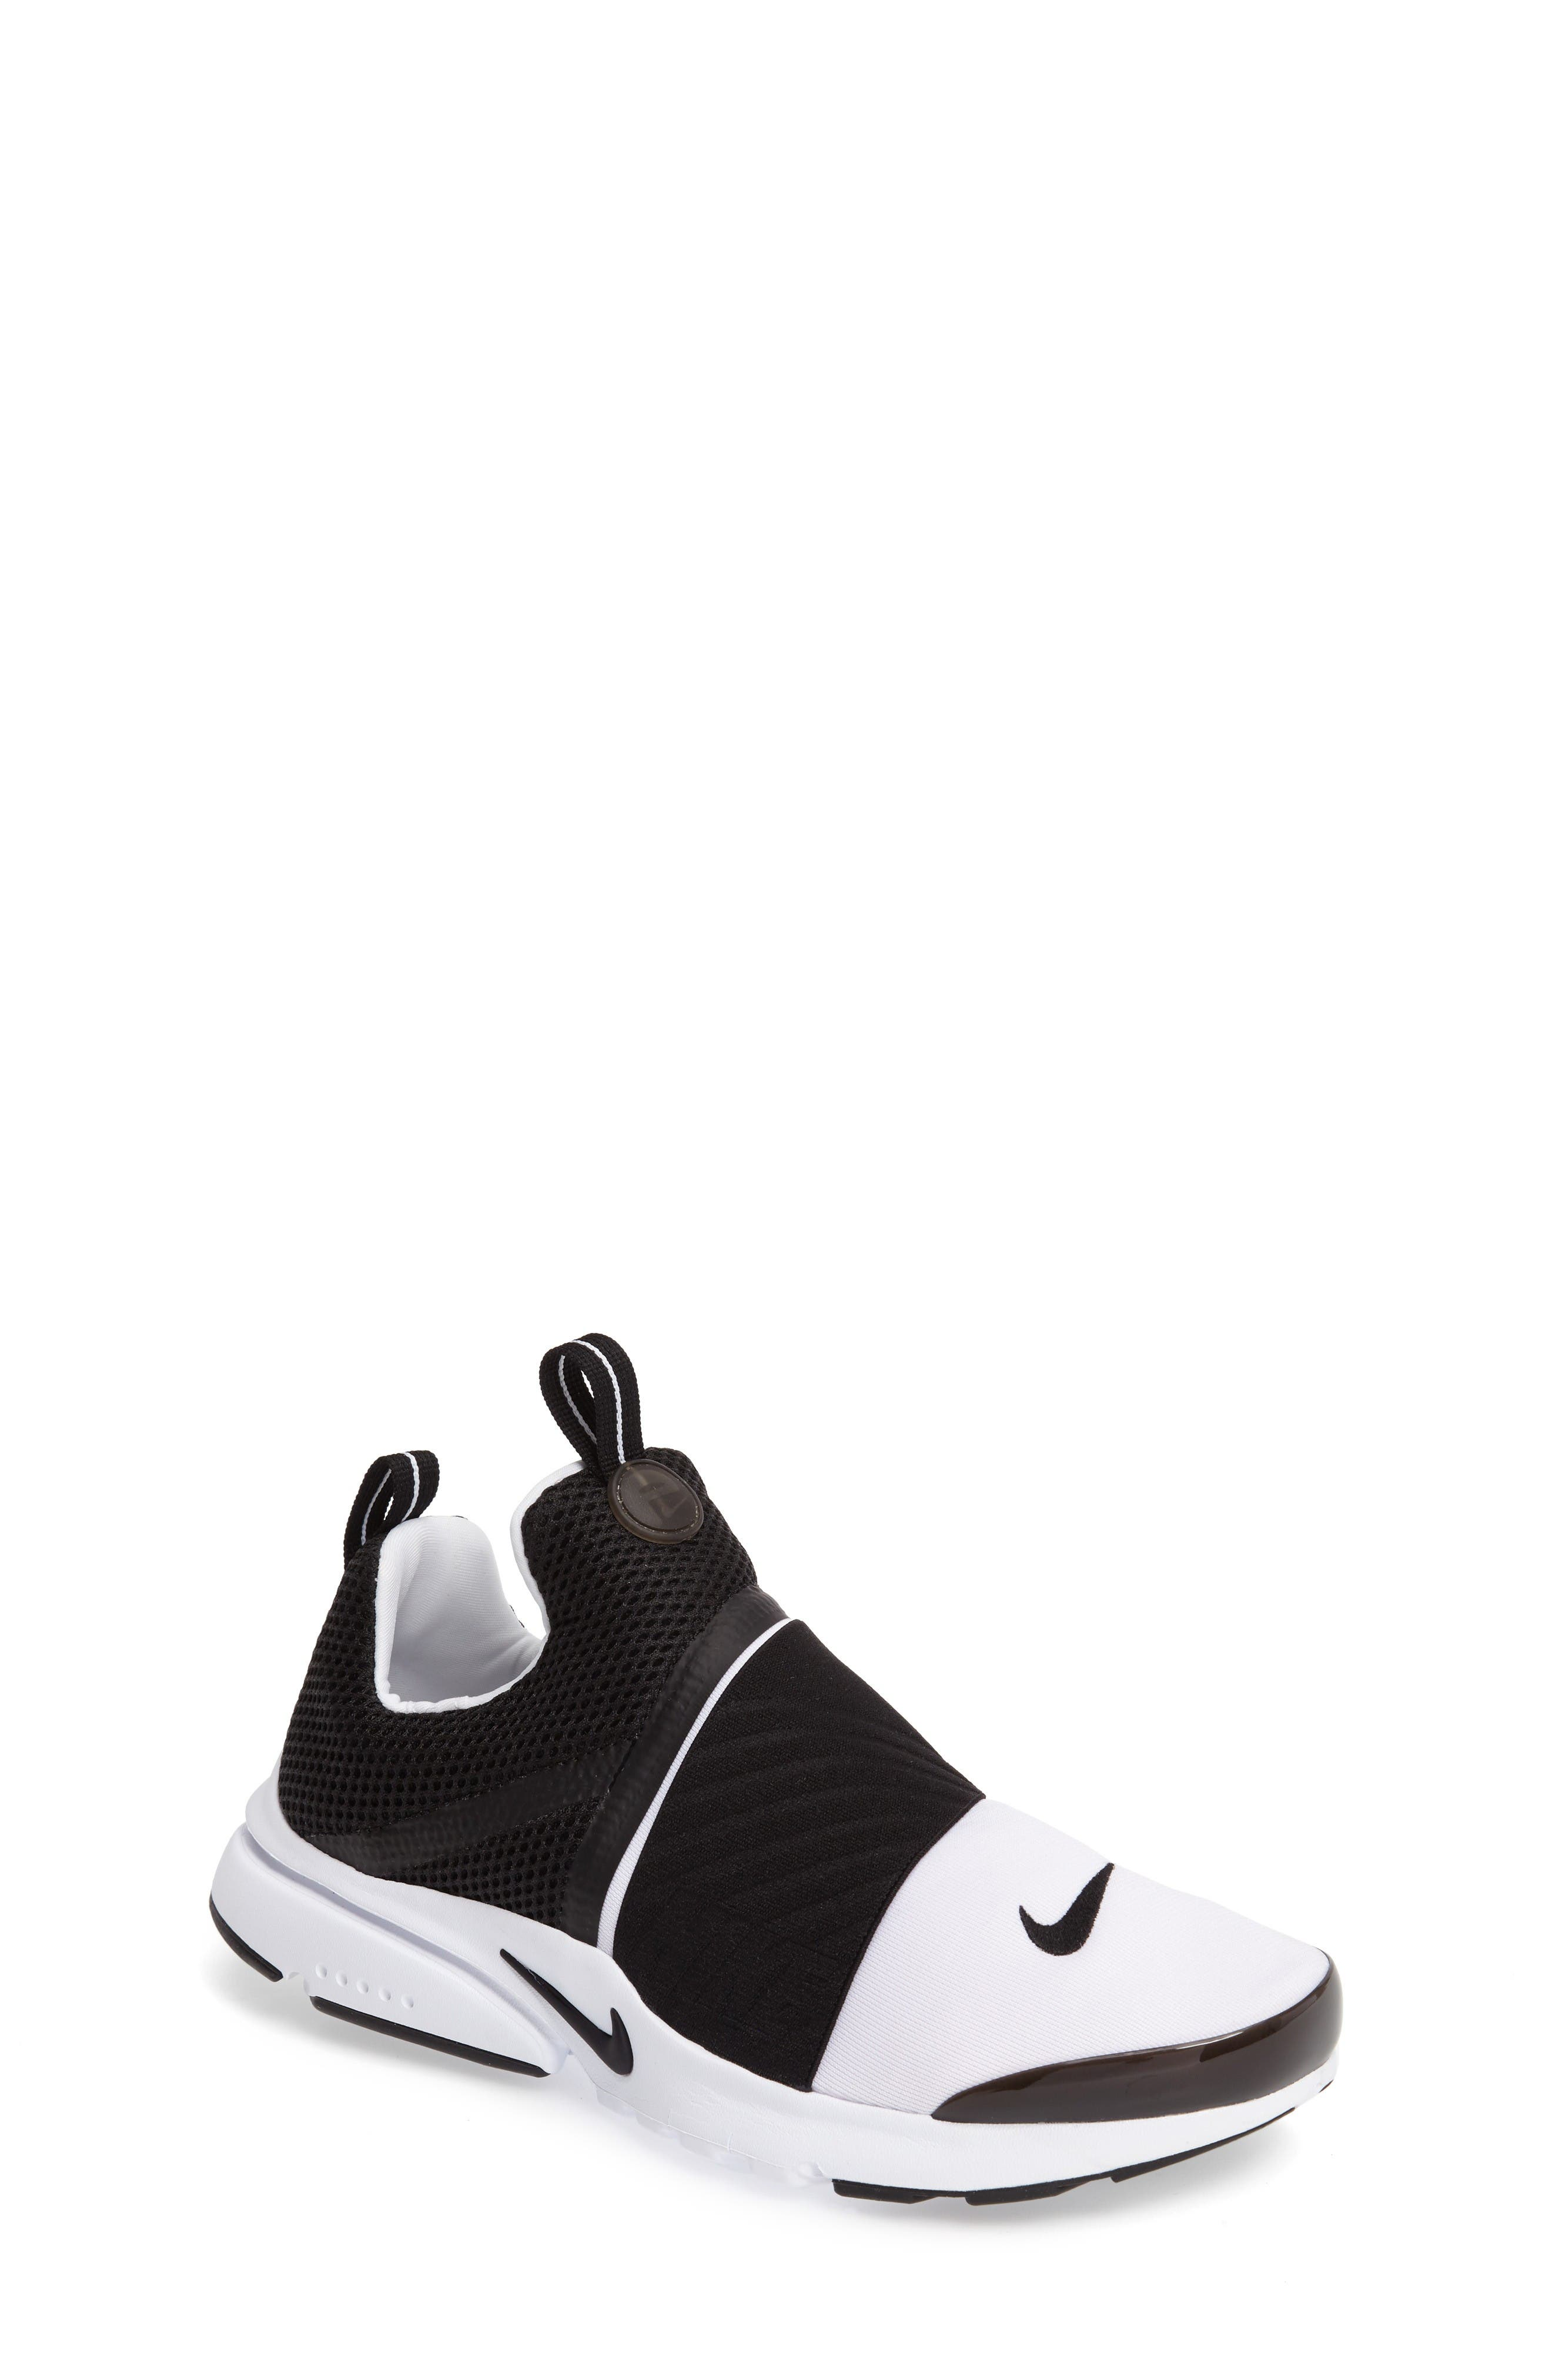 Nike Presto Extreme Sneaker (Walker, Toddler, Little Kid & Big Kid)